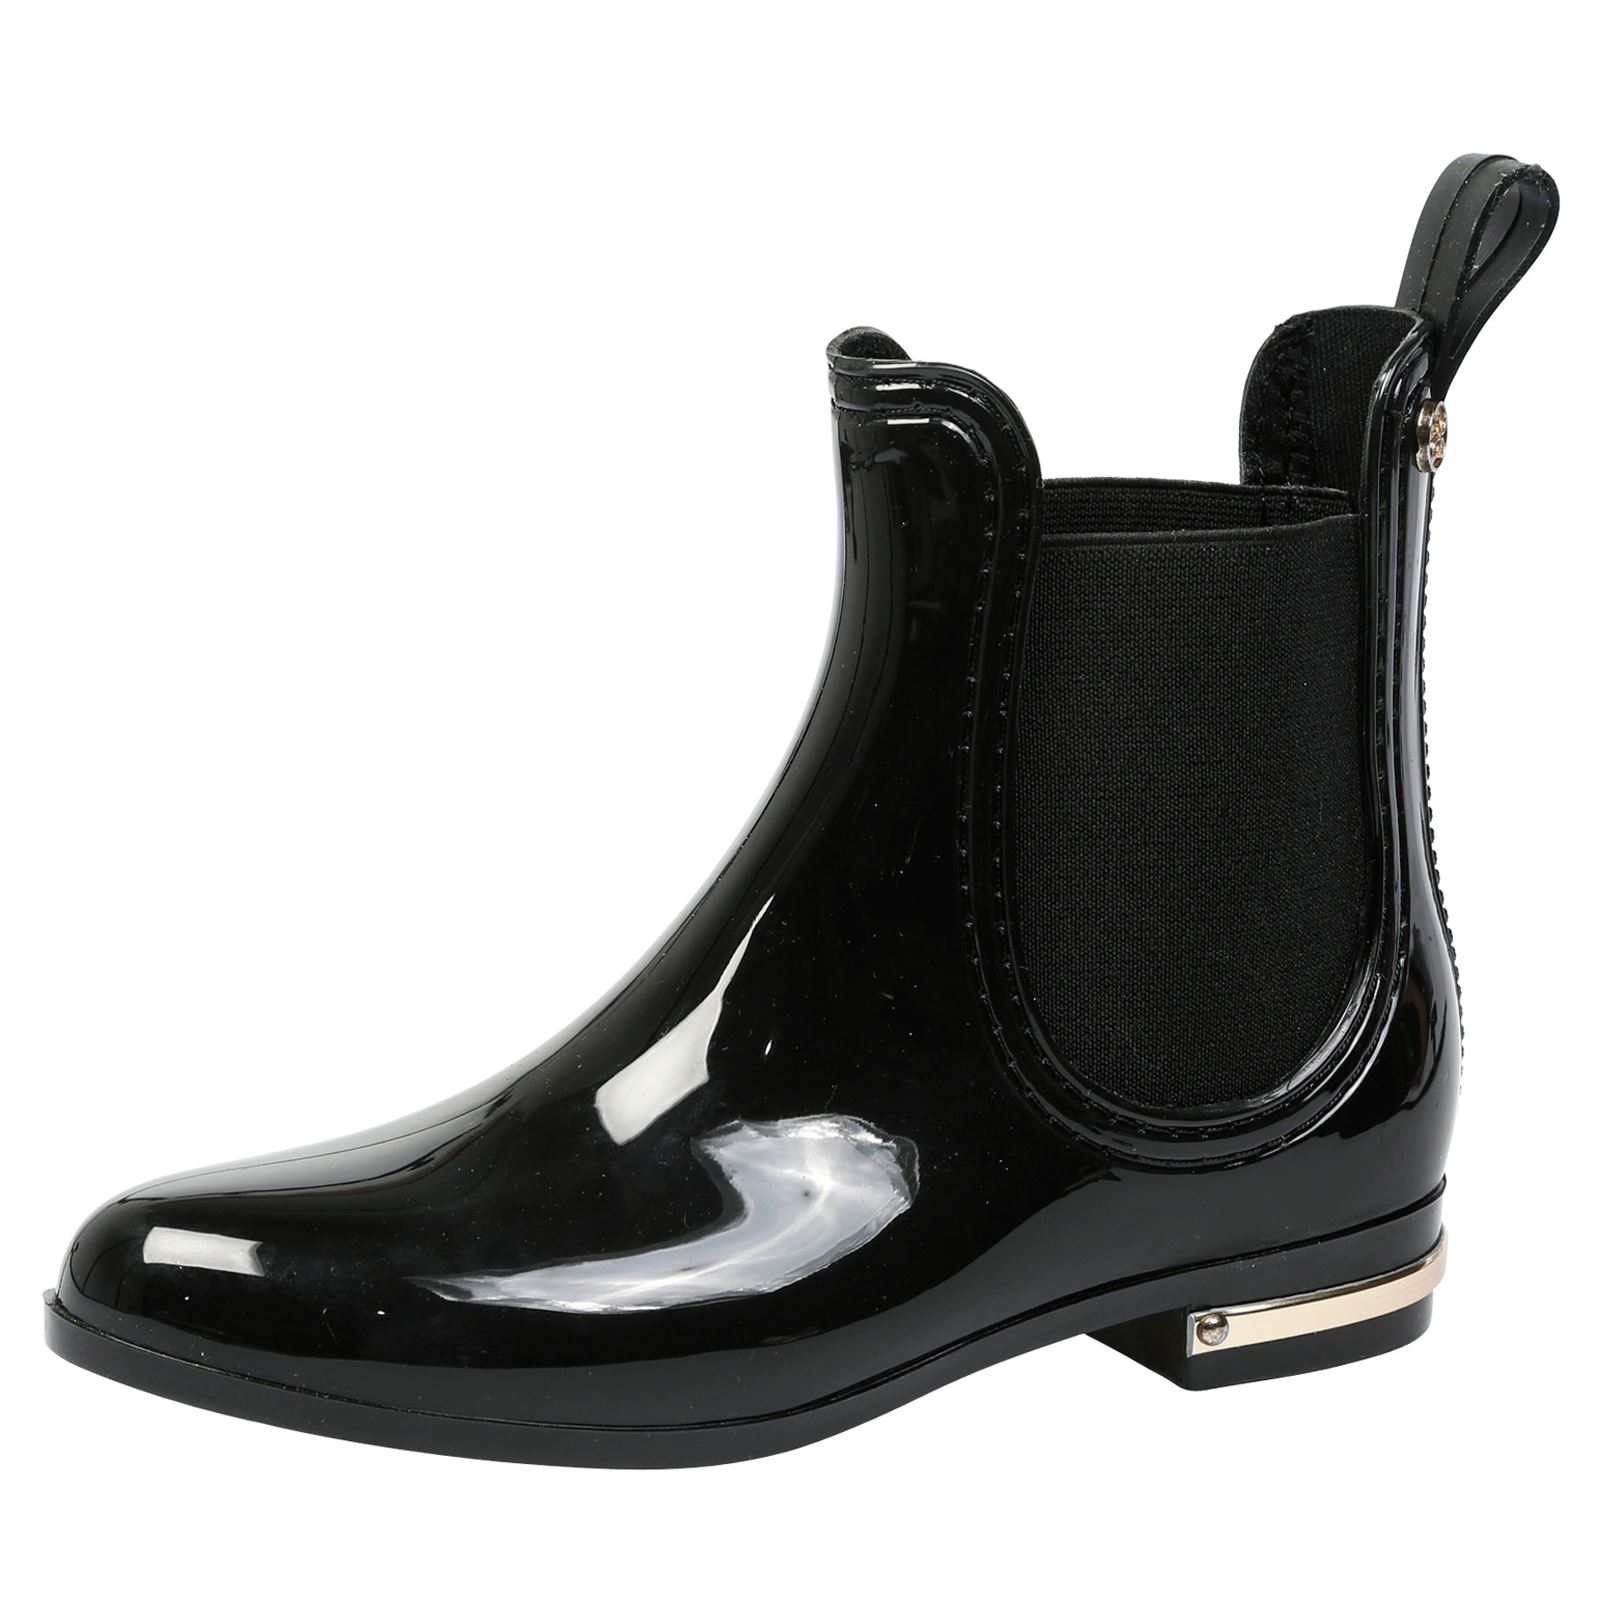 Over Shoe Rain Boots Size